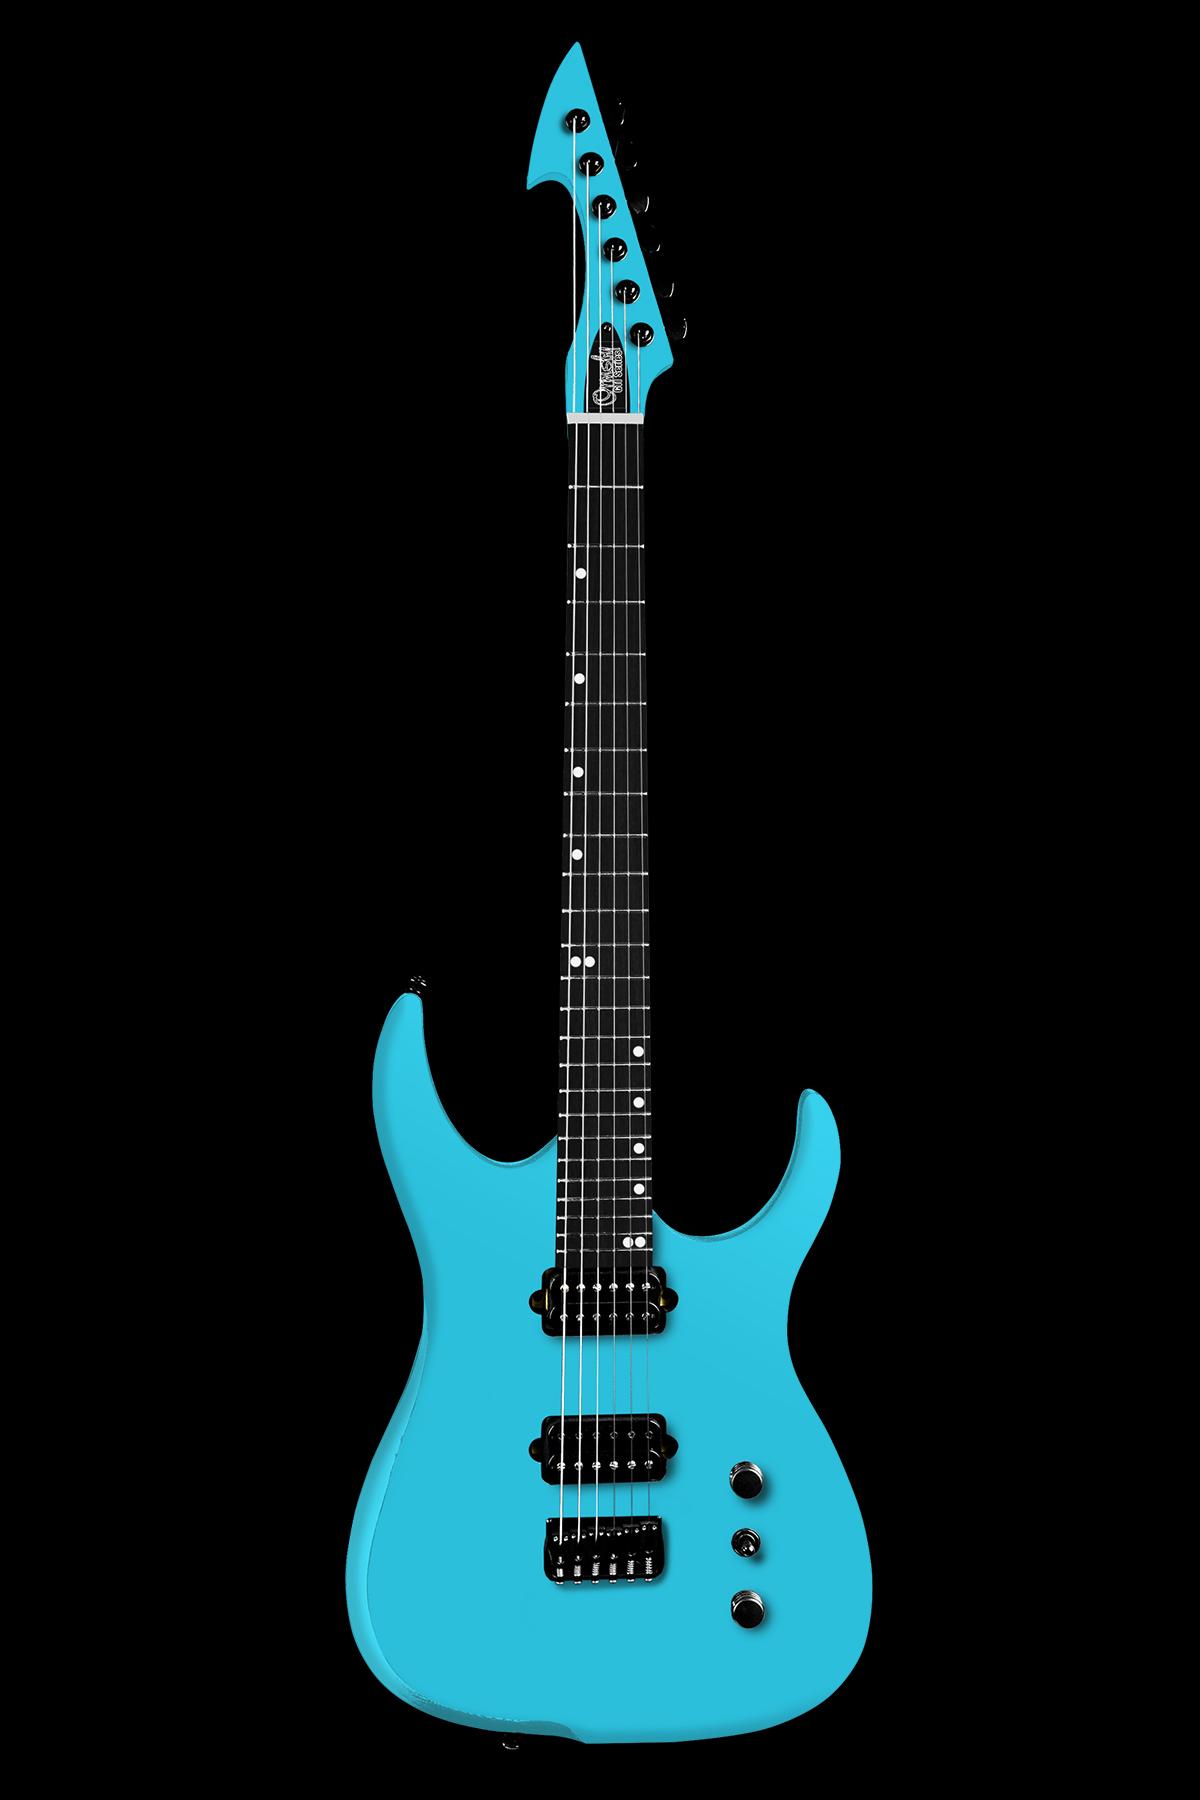 orsmby guitars GTI standard